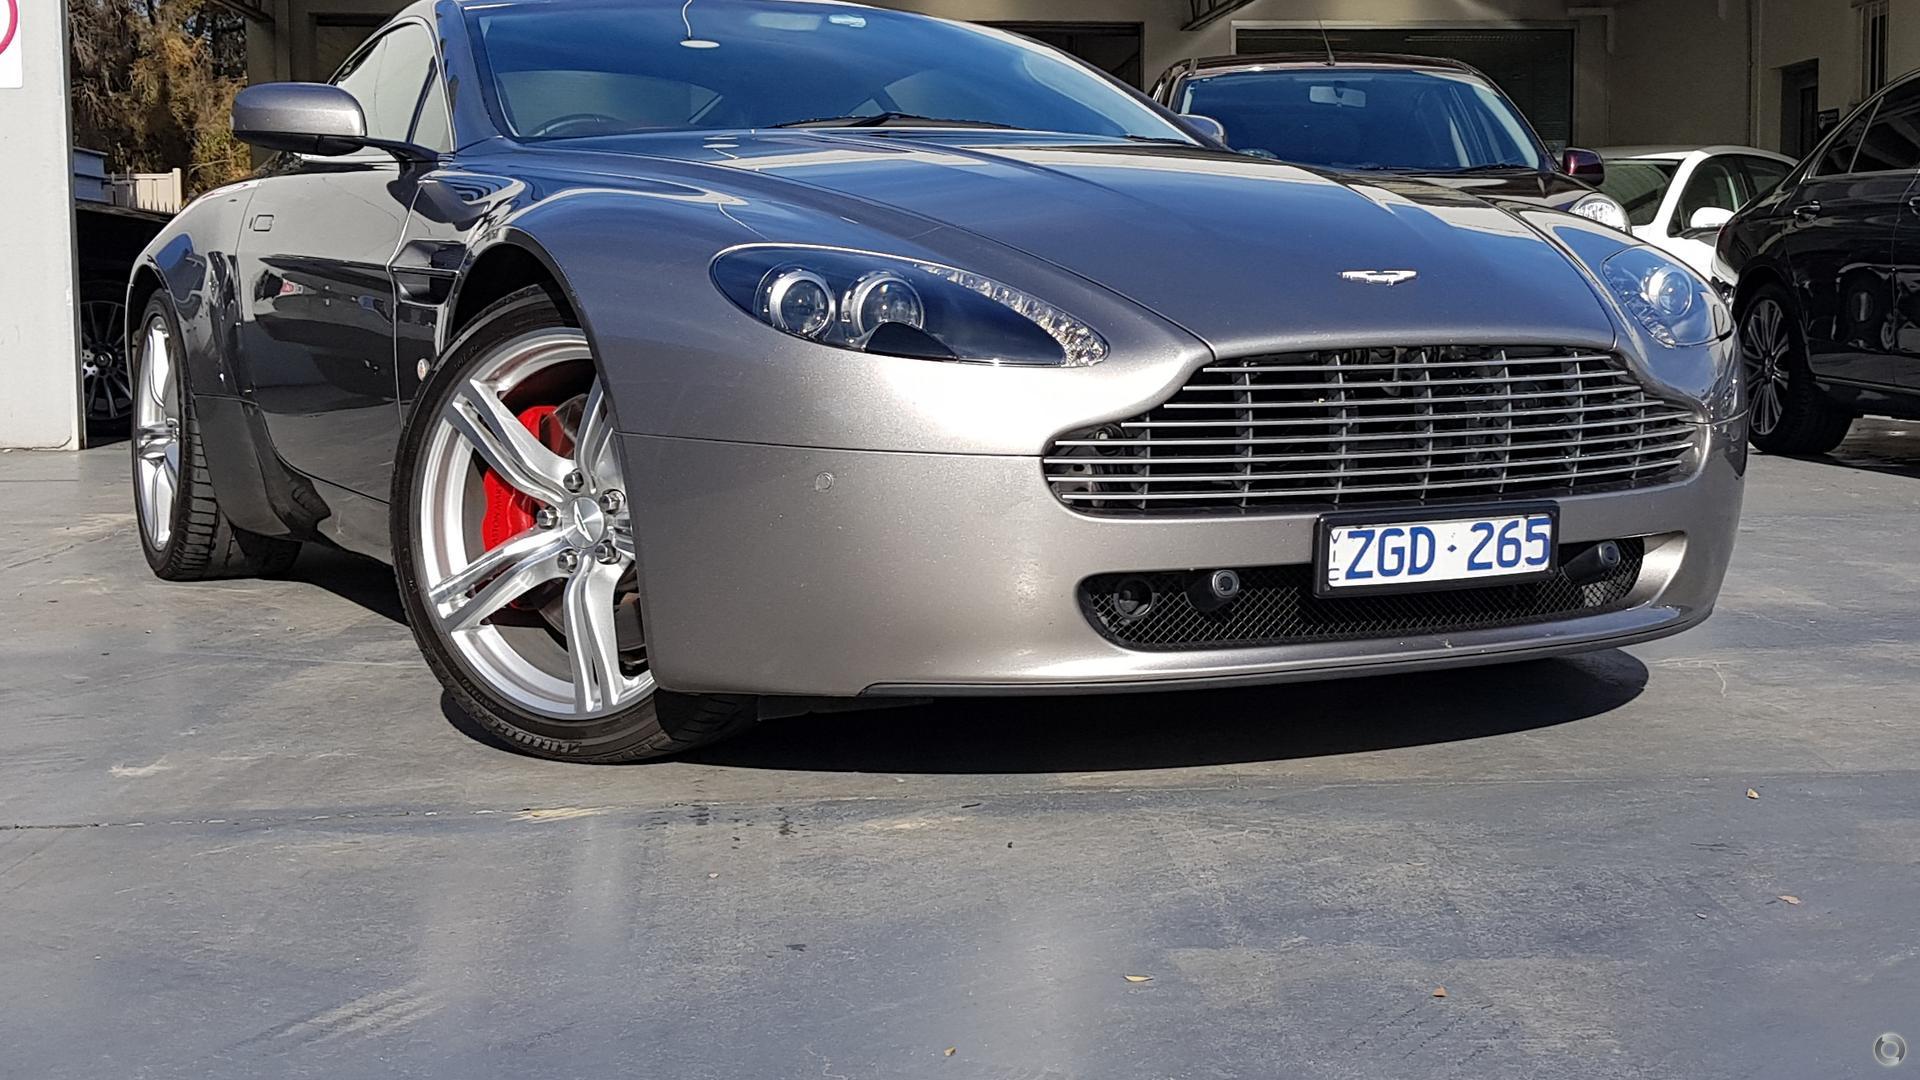 2008 Aston Martin V8 Vantage (No Series)